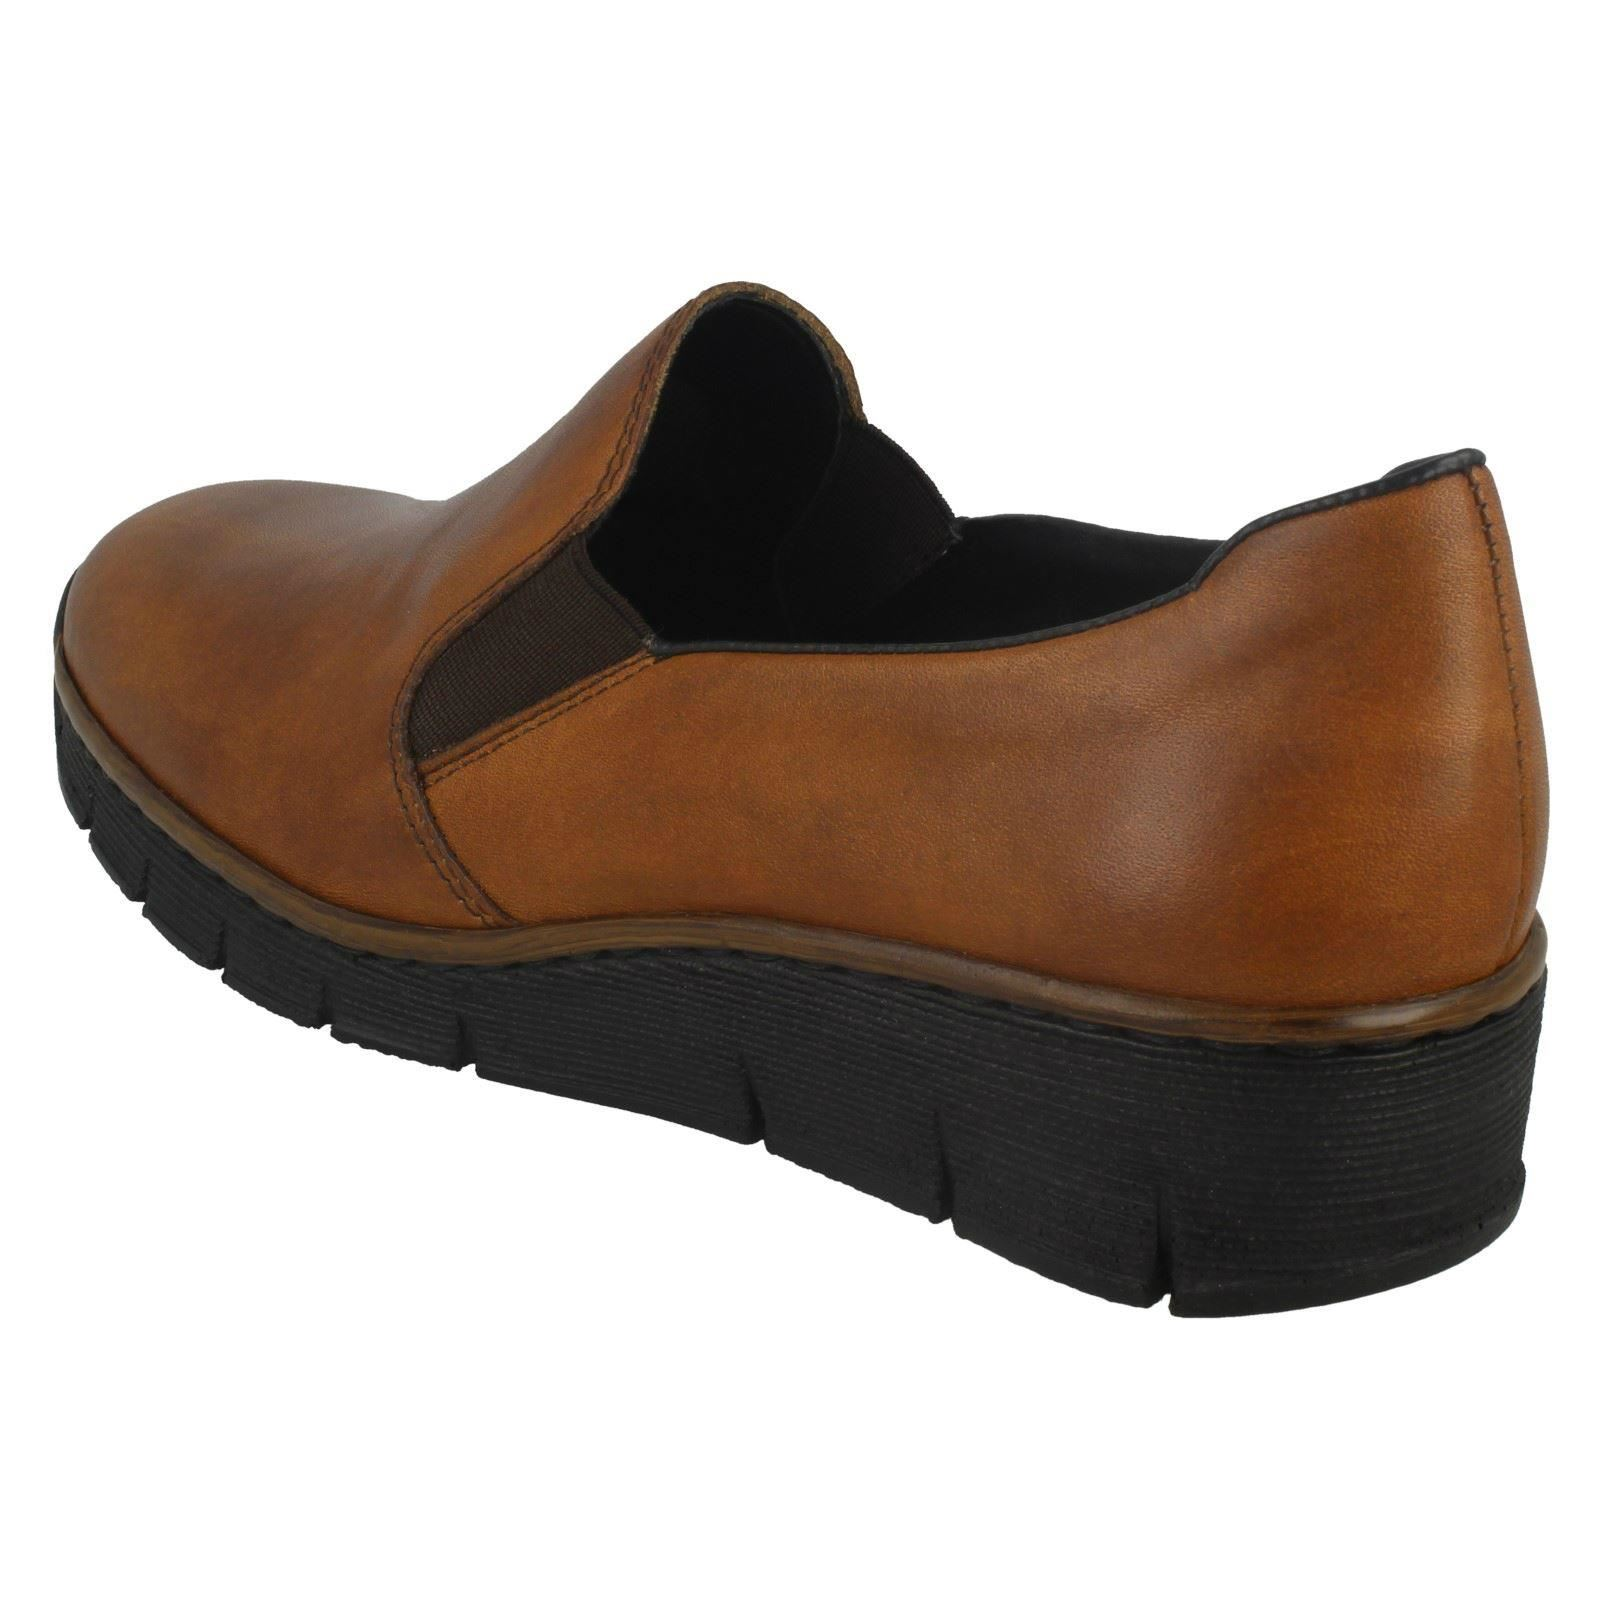 Femmes Rieker Synthétique à Enfiler Chaussures De Loisirs 53766 *